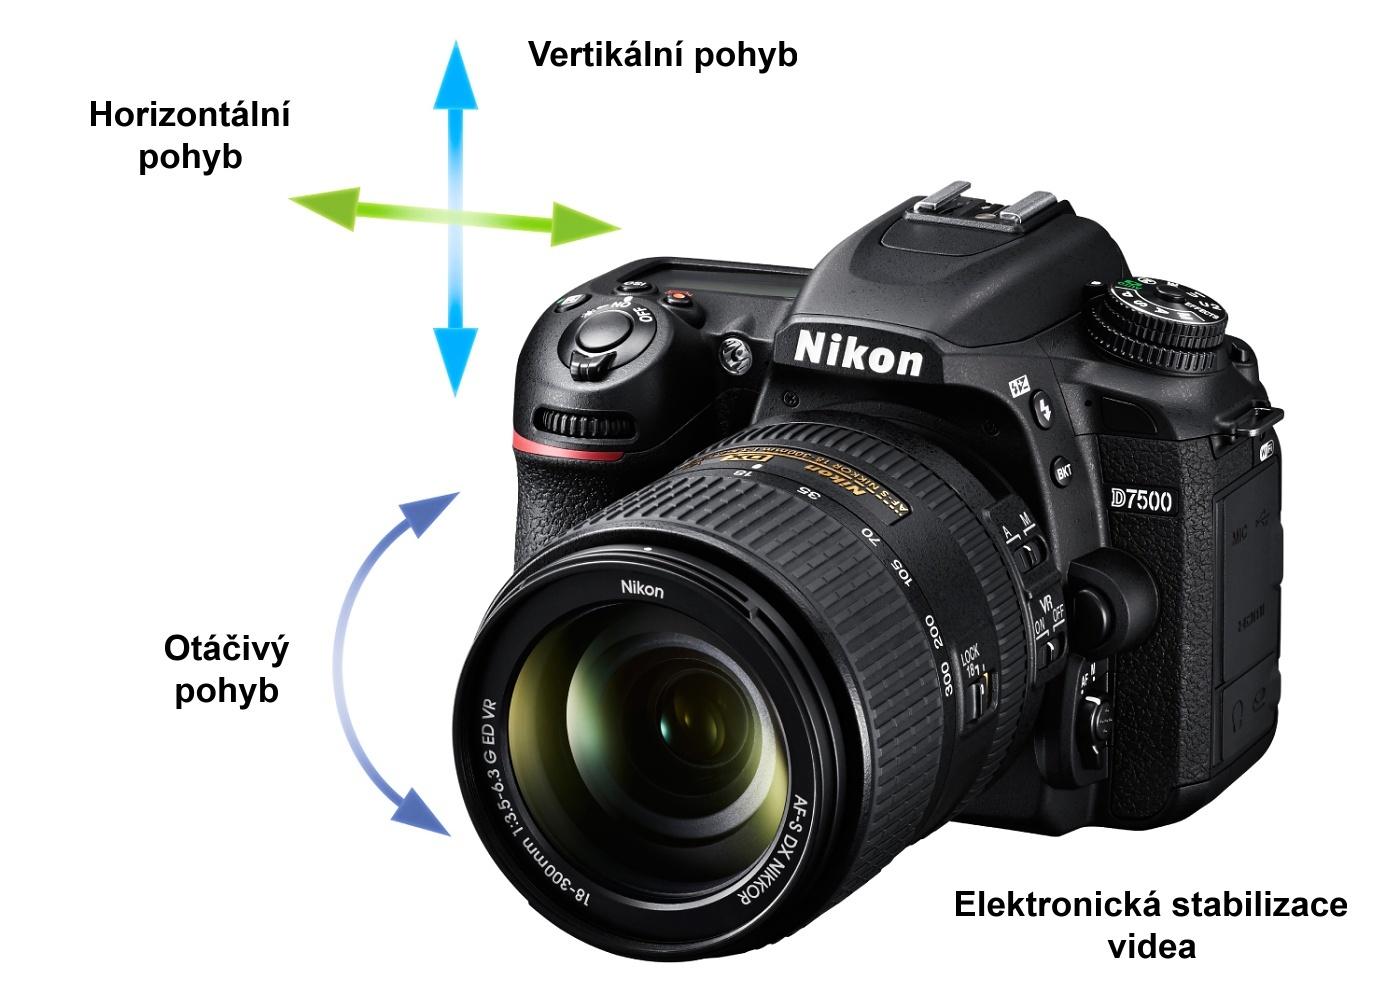 Nikon D750 elektronická stabilizace videa